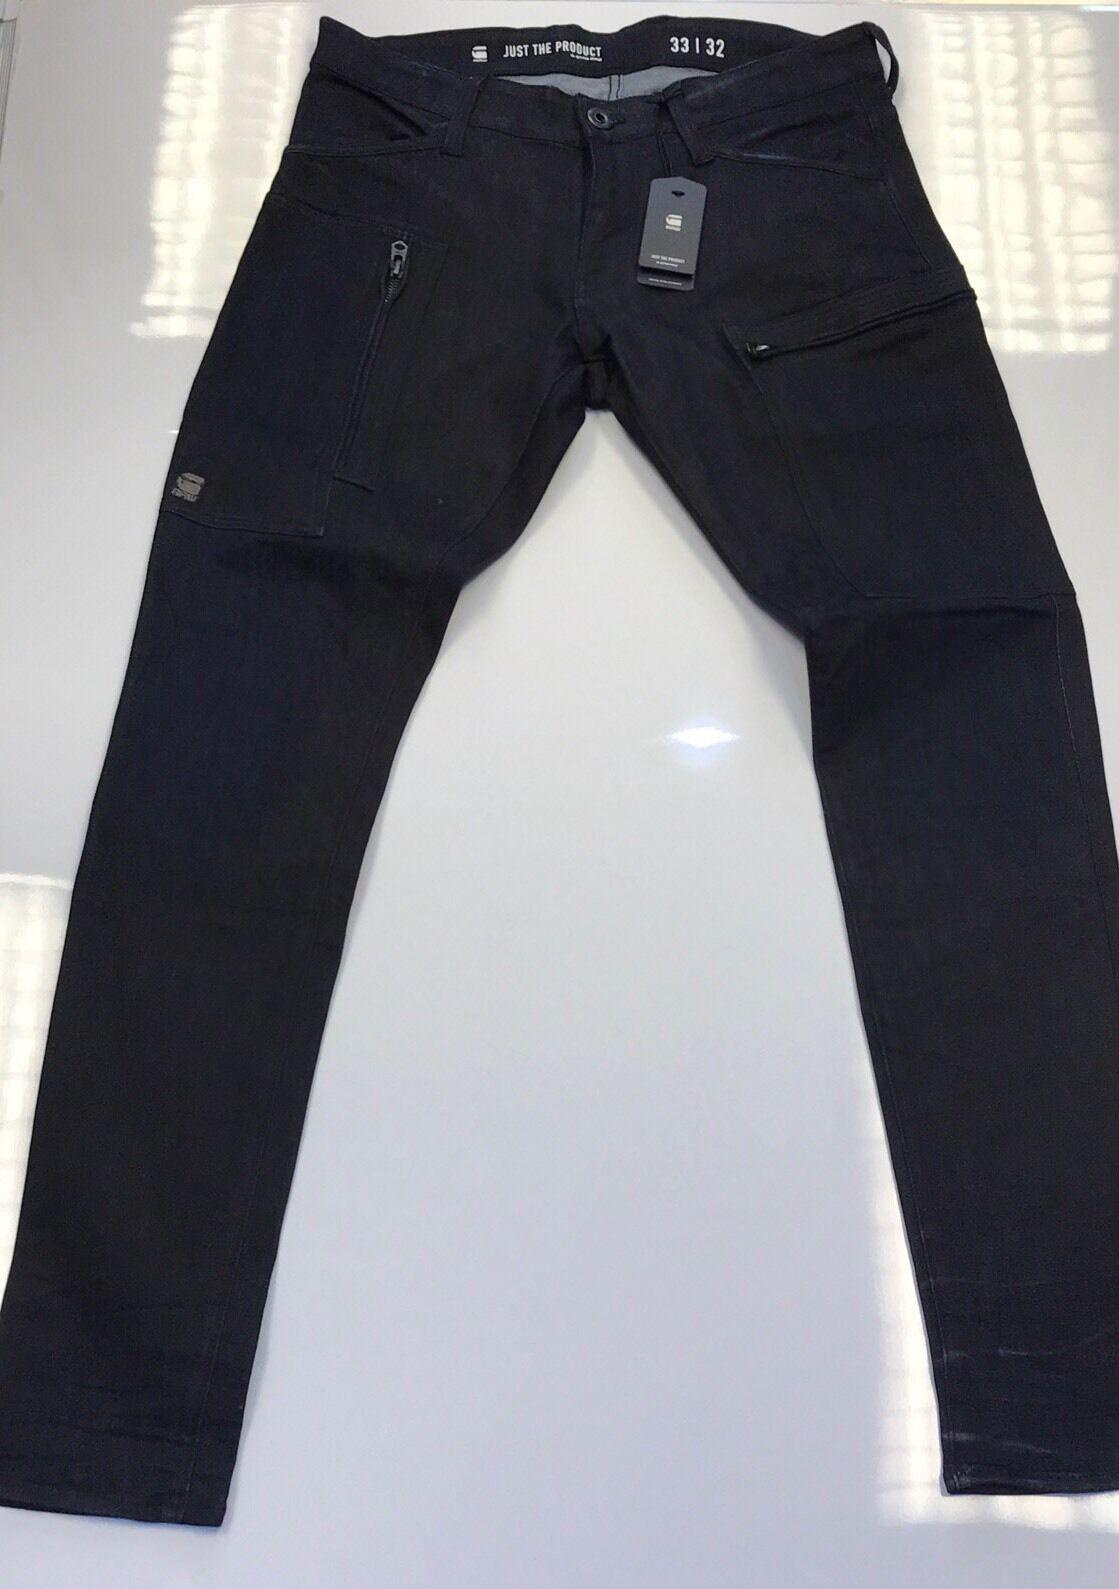 G Star Raw Super Slim Navy bluee Jeans